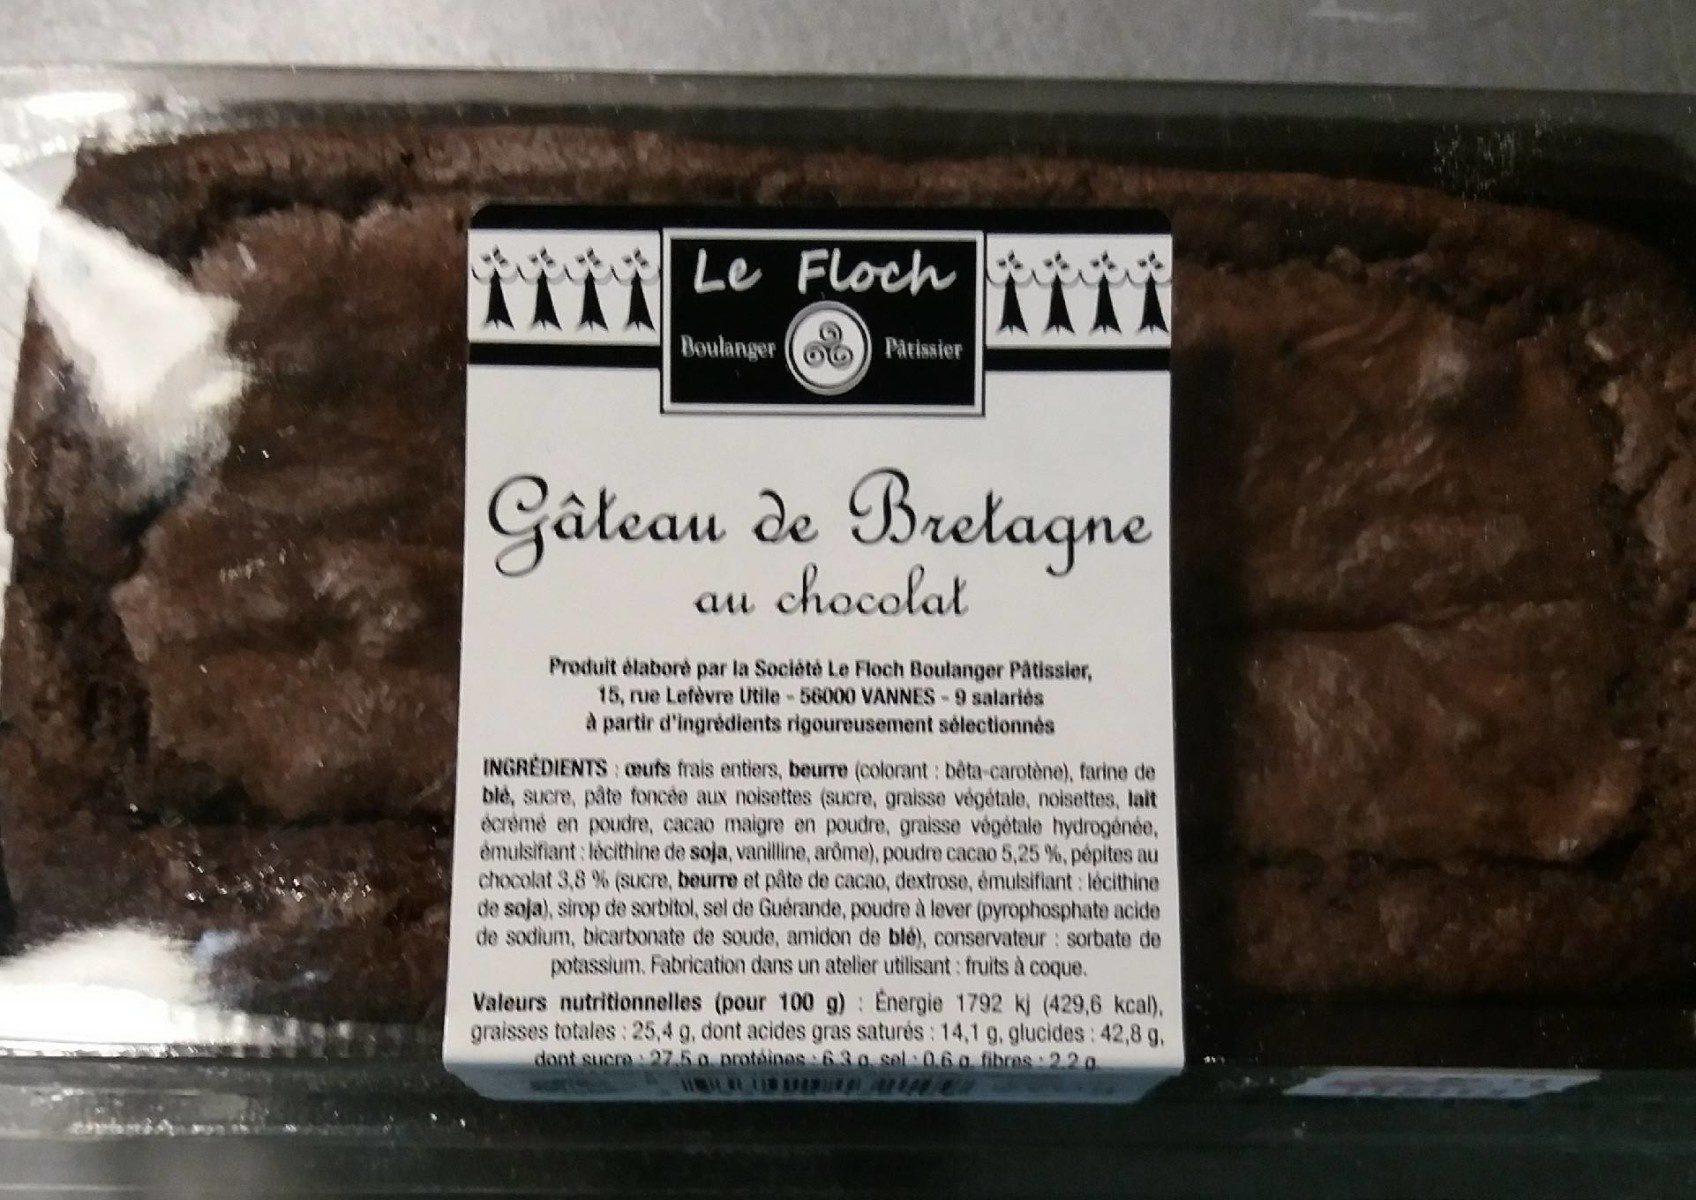 Gâteau de Bretagne au Chocolat - Produit